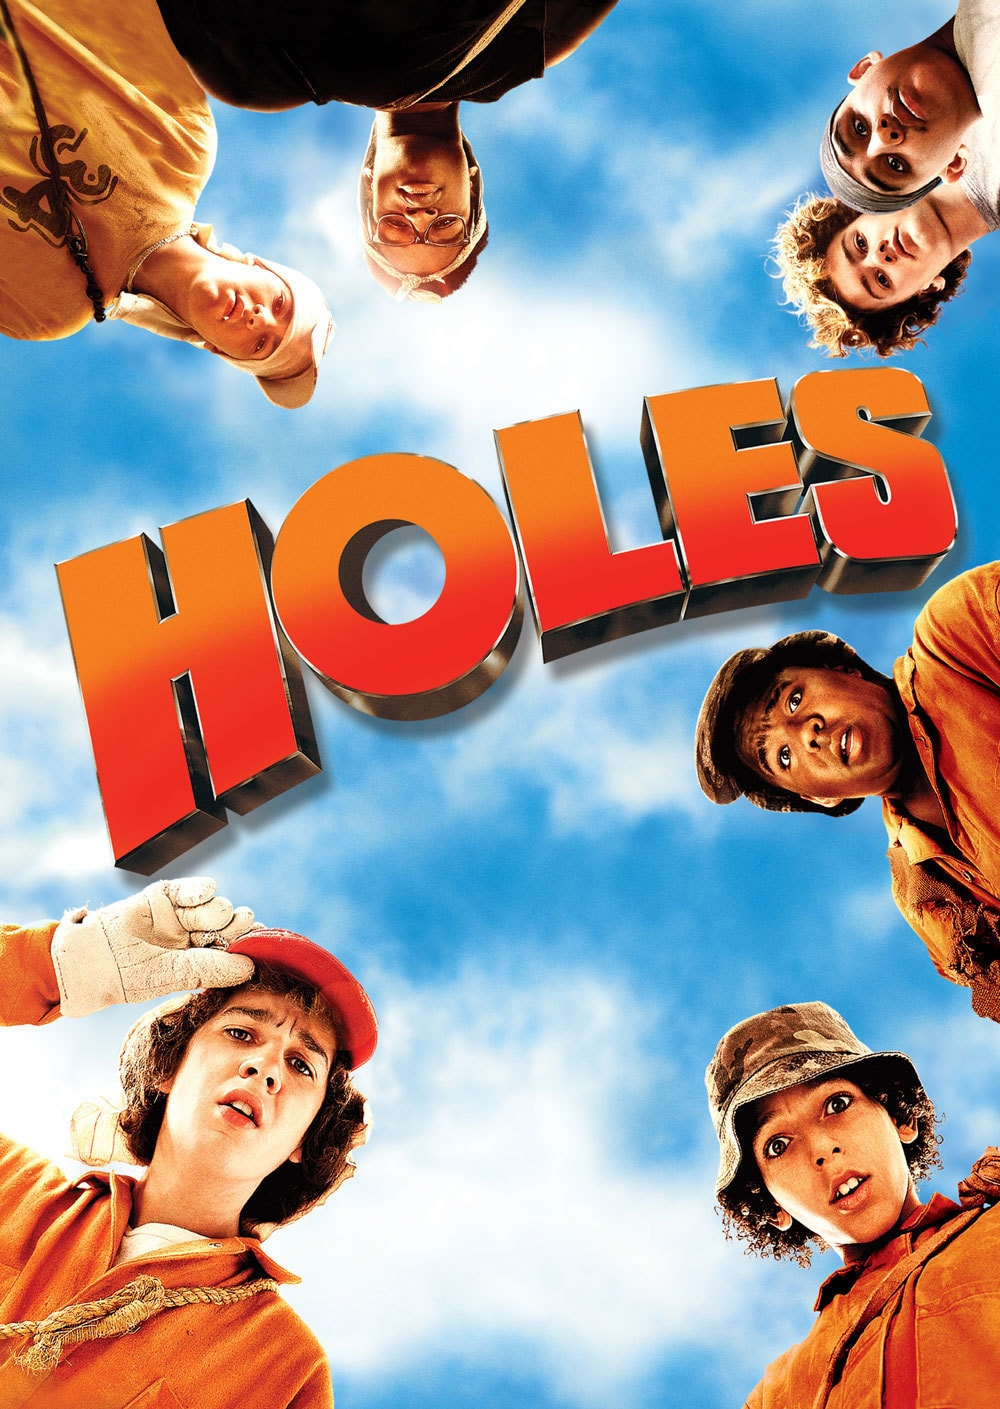 holes disney movies